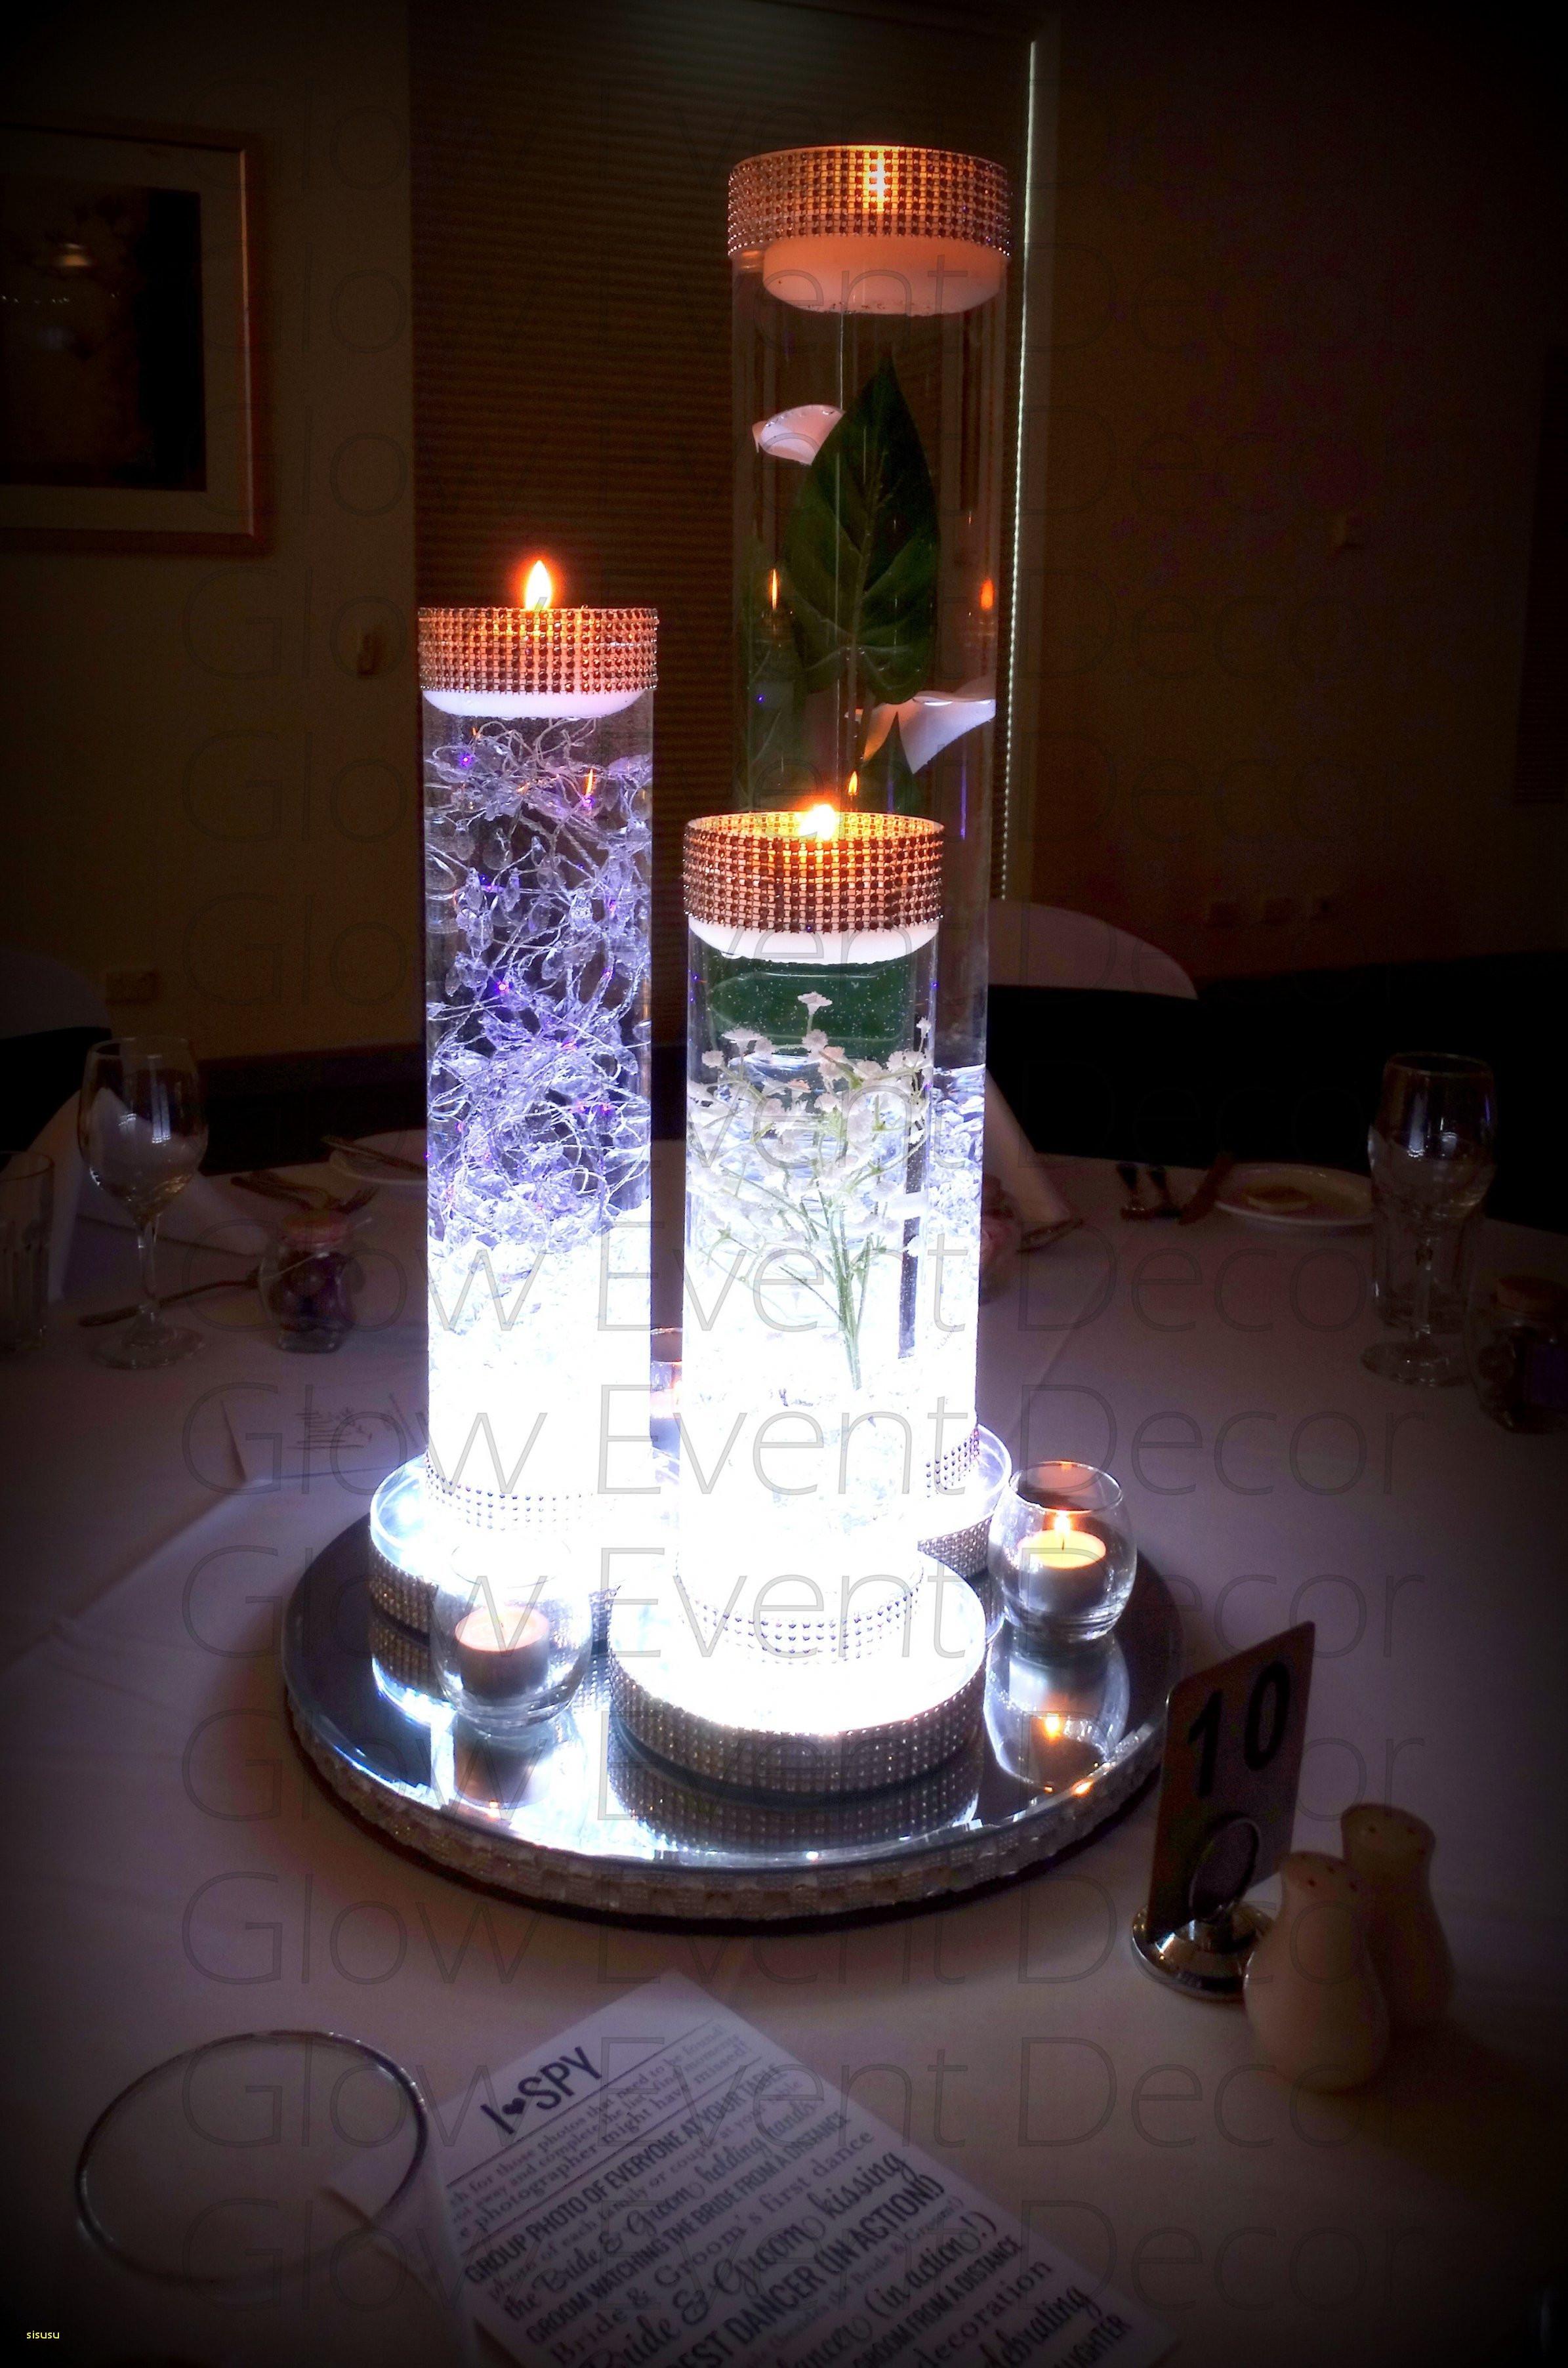 4 inch vase of new led underwater lighting best landscaping ideas throughout vases led base lights for 4 inch round wedding vase light 15 fori 0d